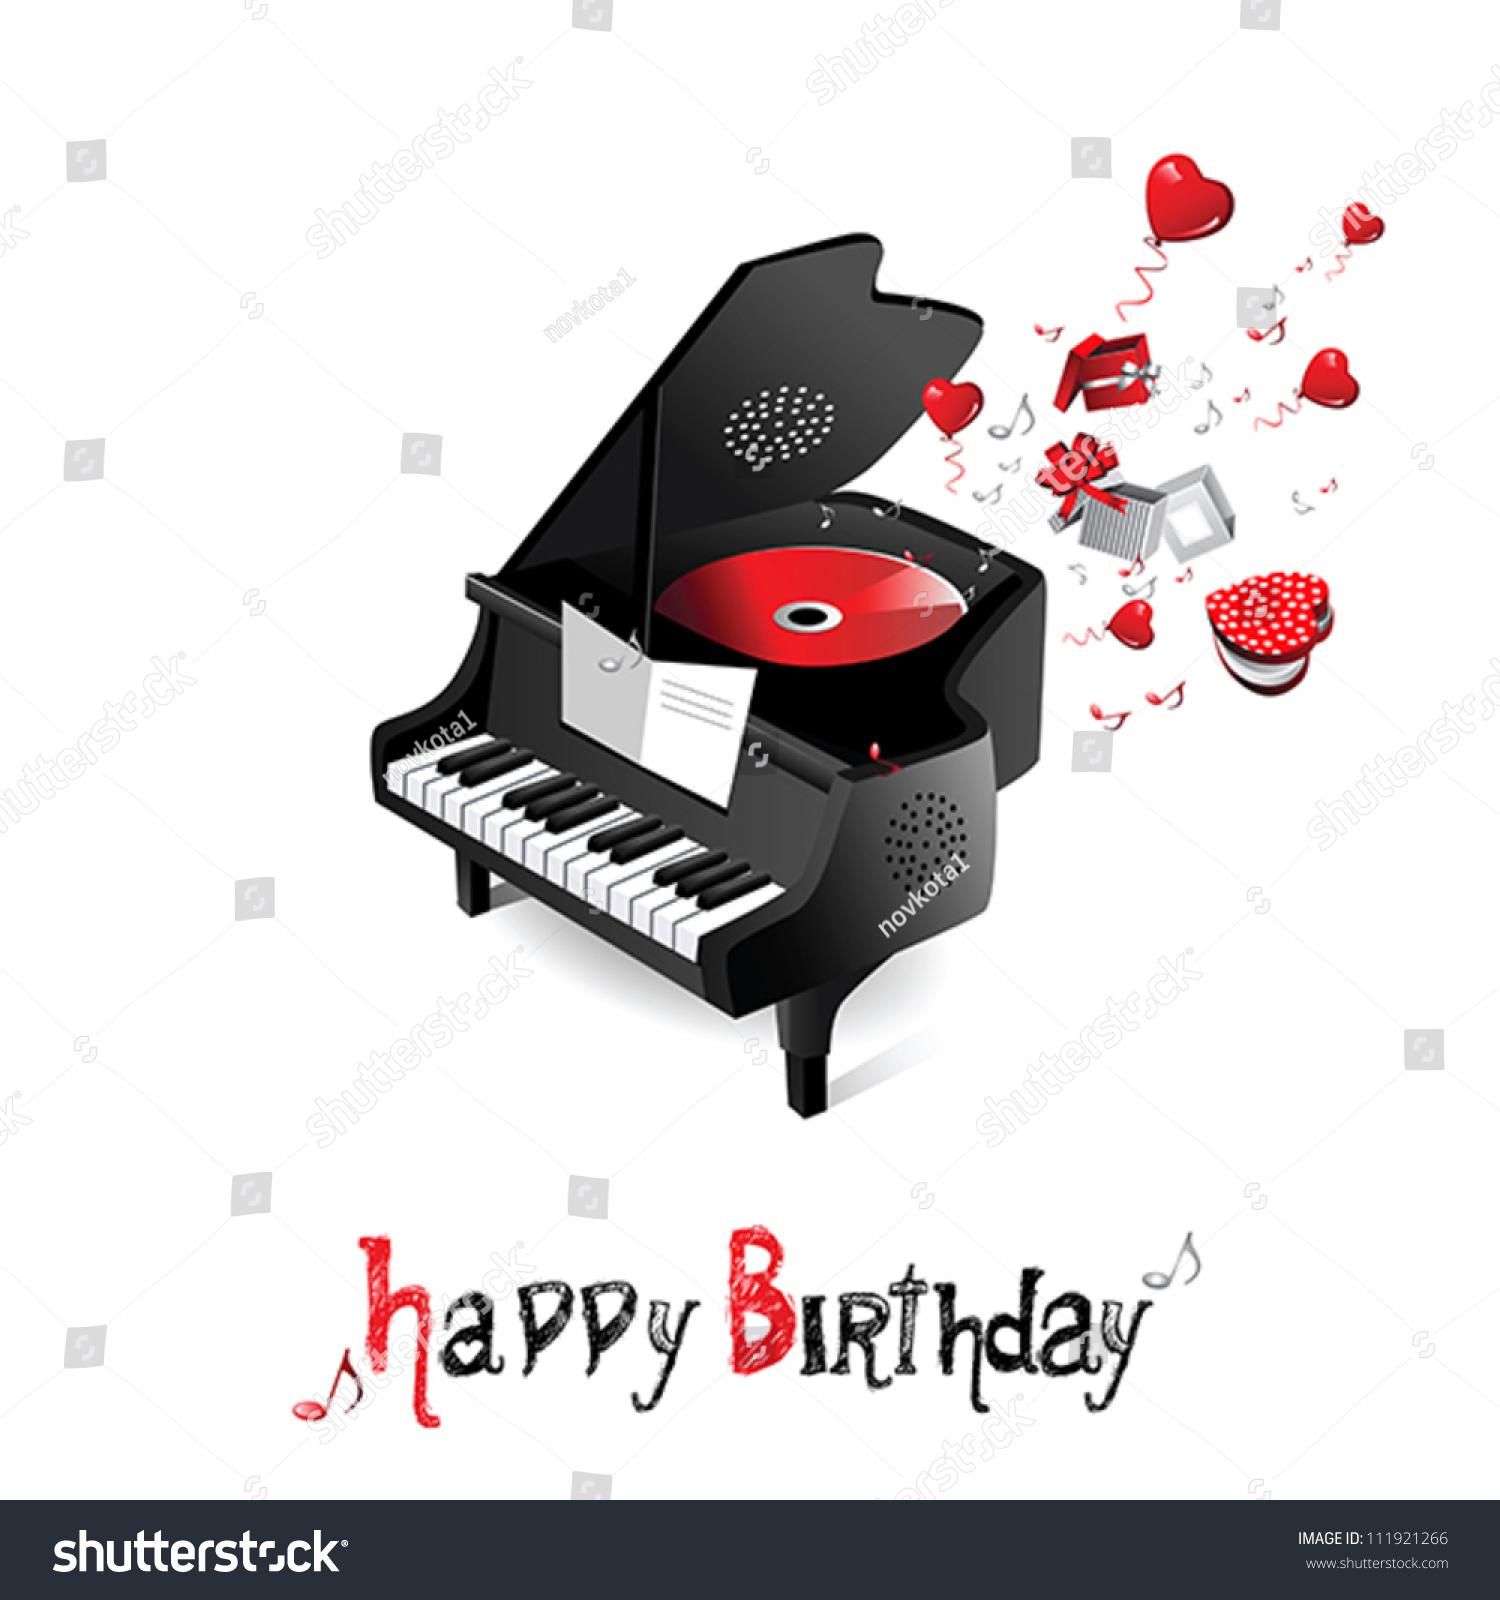 Happy Birthday Piano Stock Vector Illustration 111921266 ...